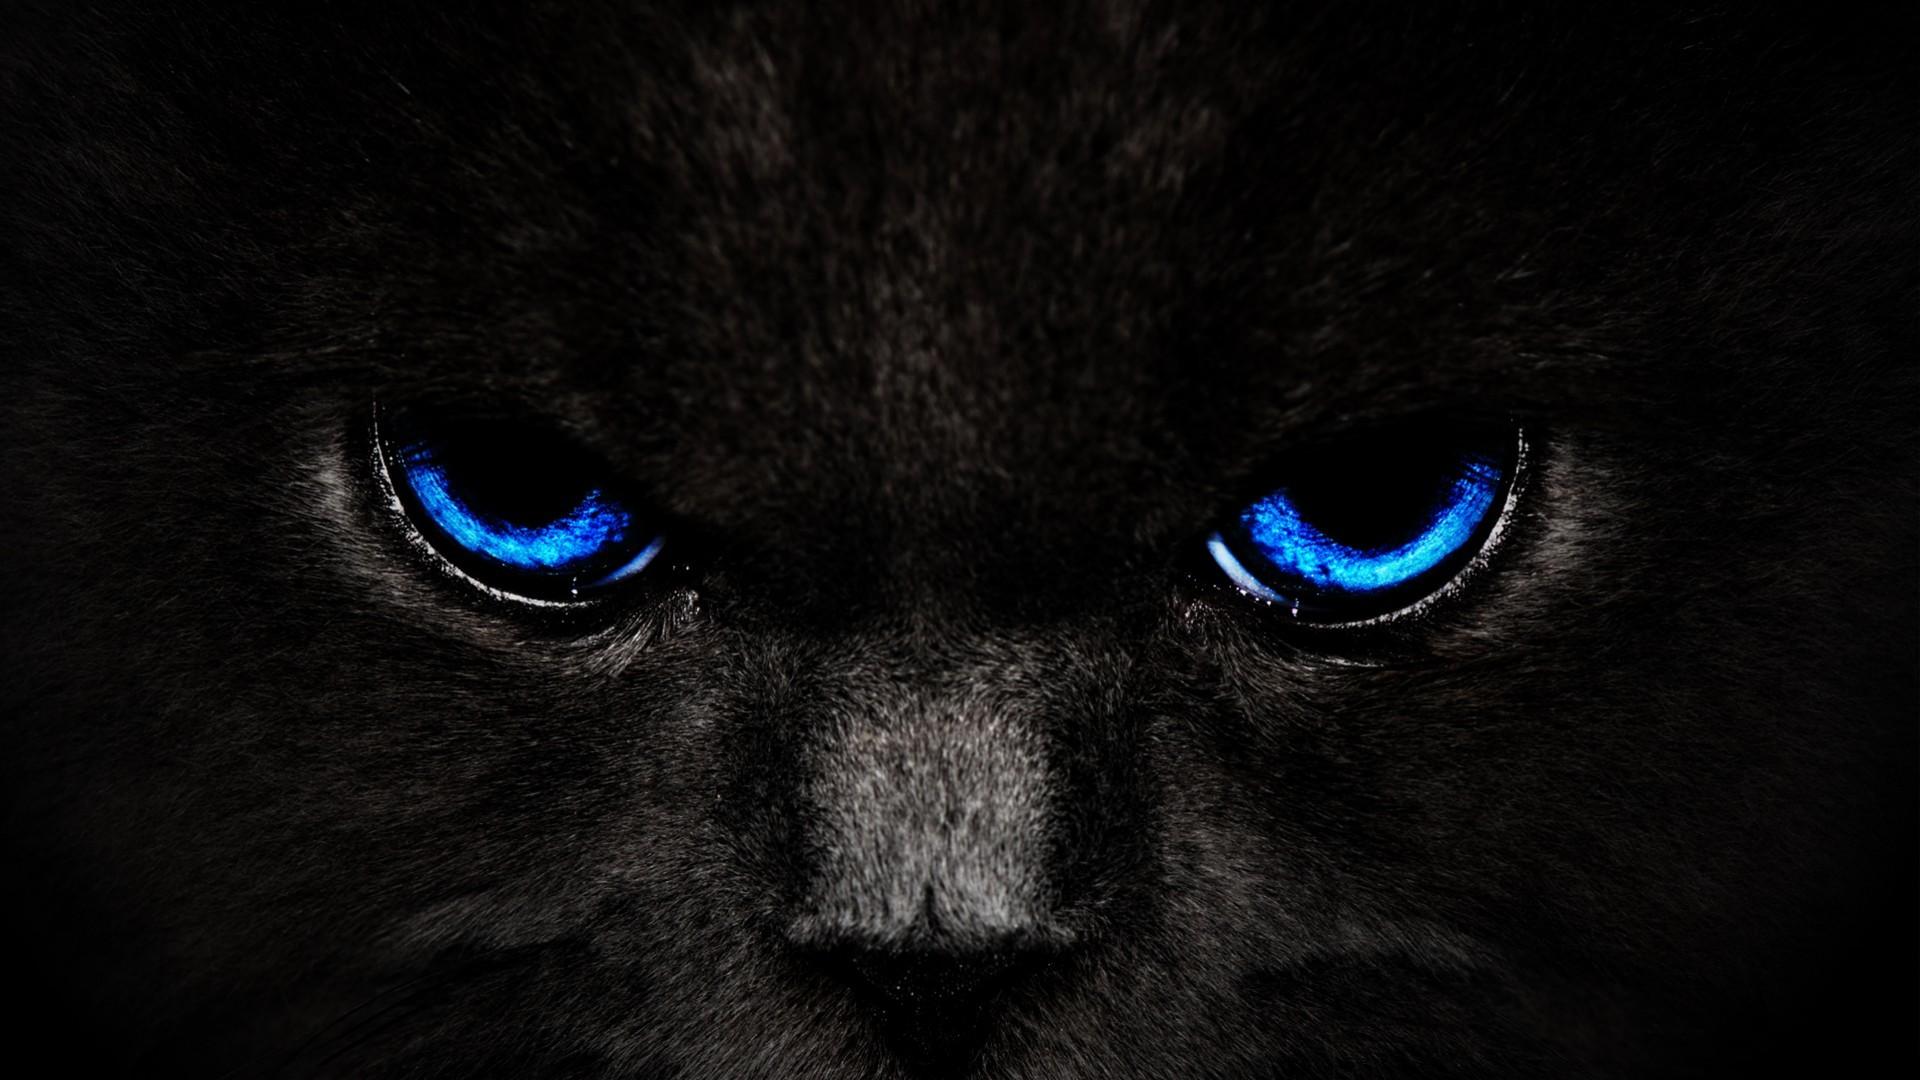 Black Cat Blue Eyes   High Quality Wallpapers,Wallpaper Desktop,High .